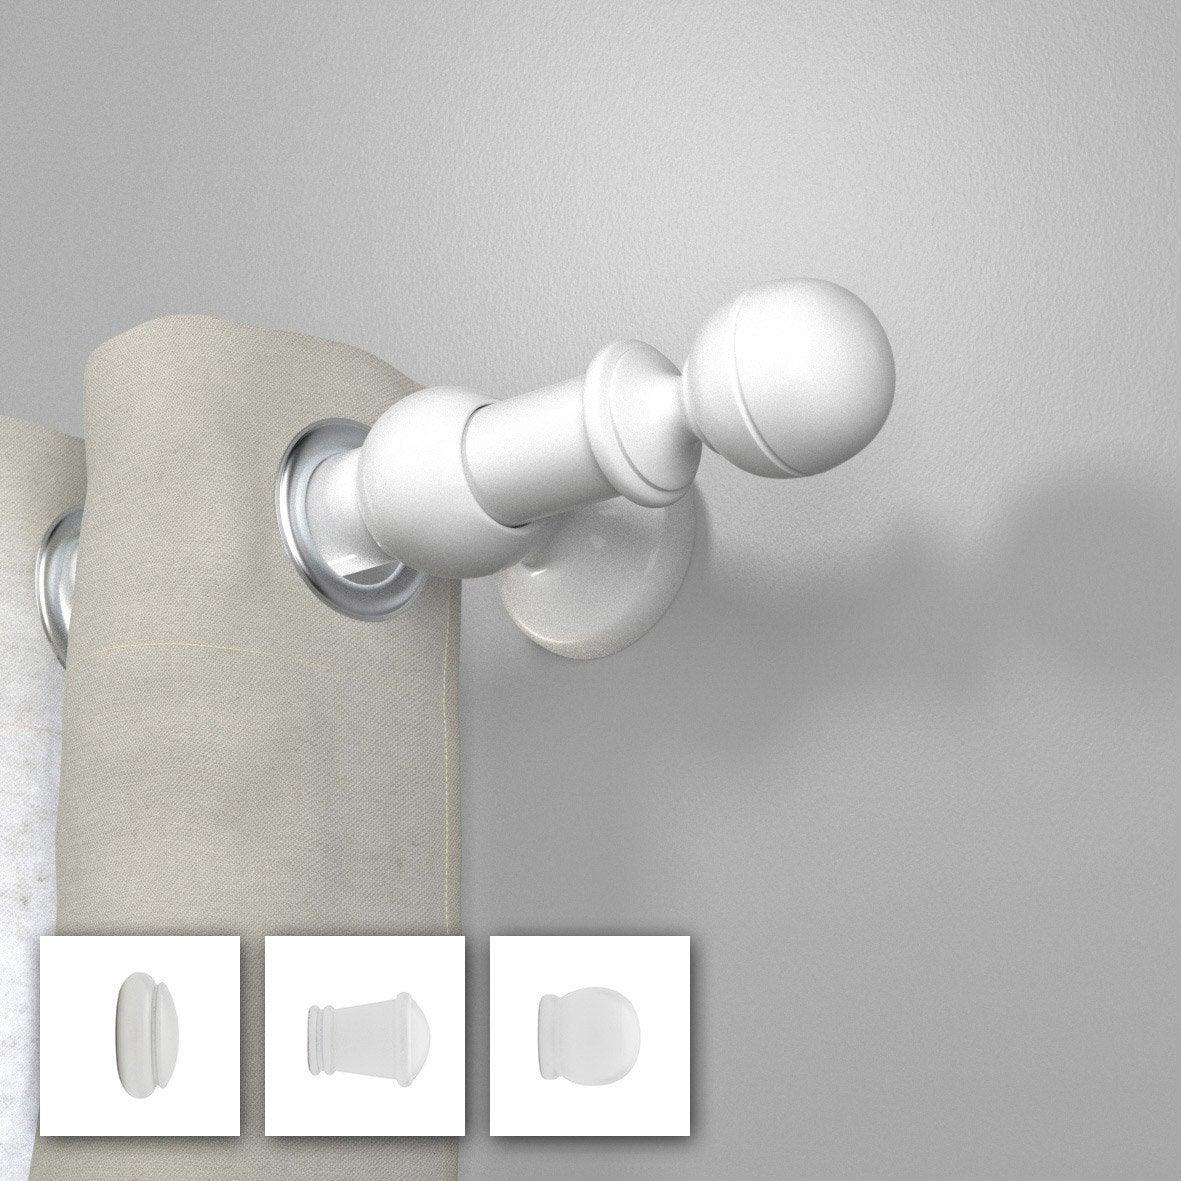 tringle rideau sans percer leroy merlin fabulous cable acier rideau leroy merlin tringle rideau. Black Bedroom Furniture Sets. Home Design Ideas